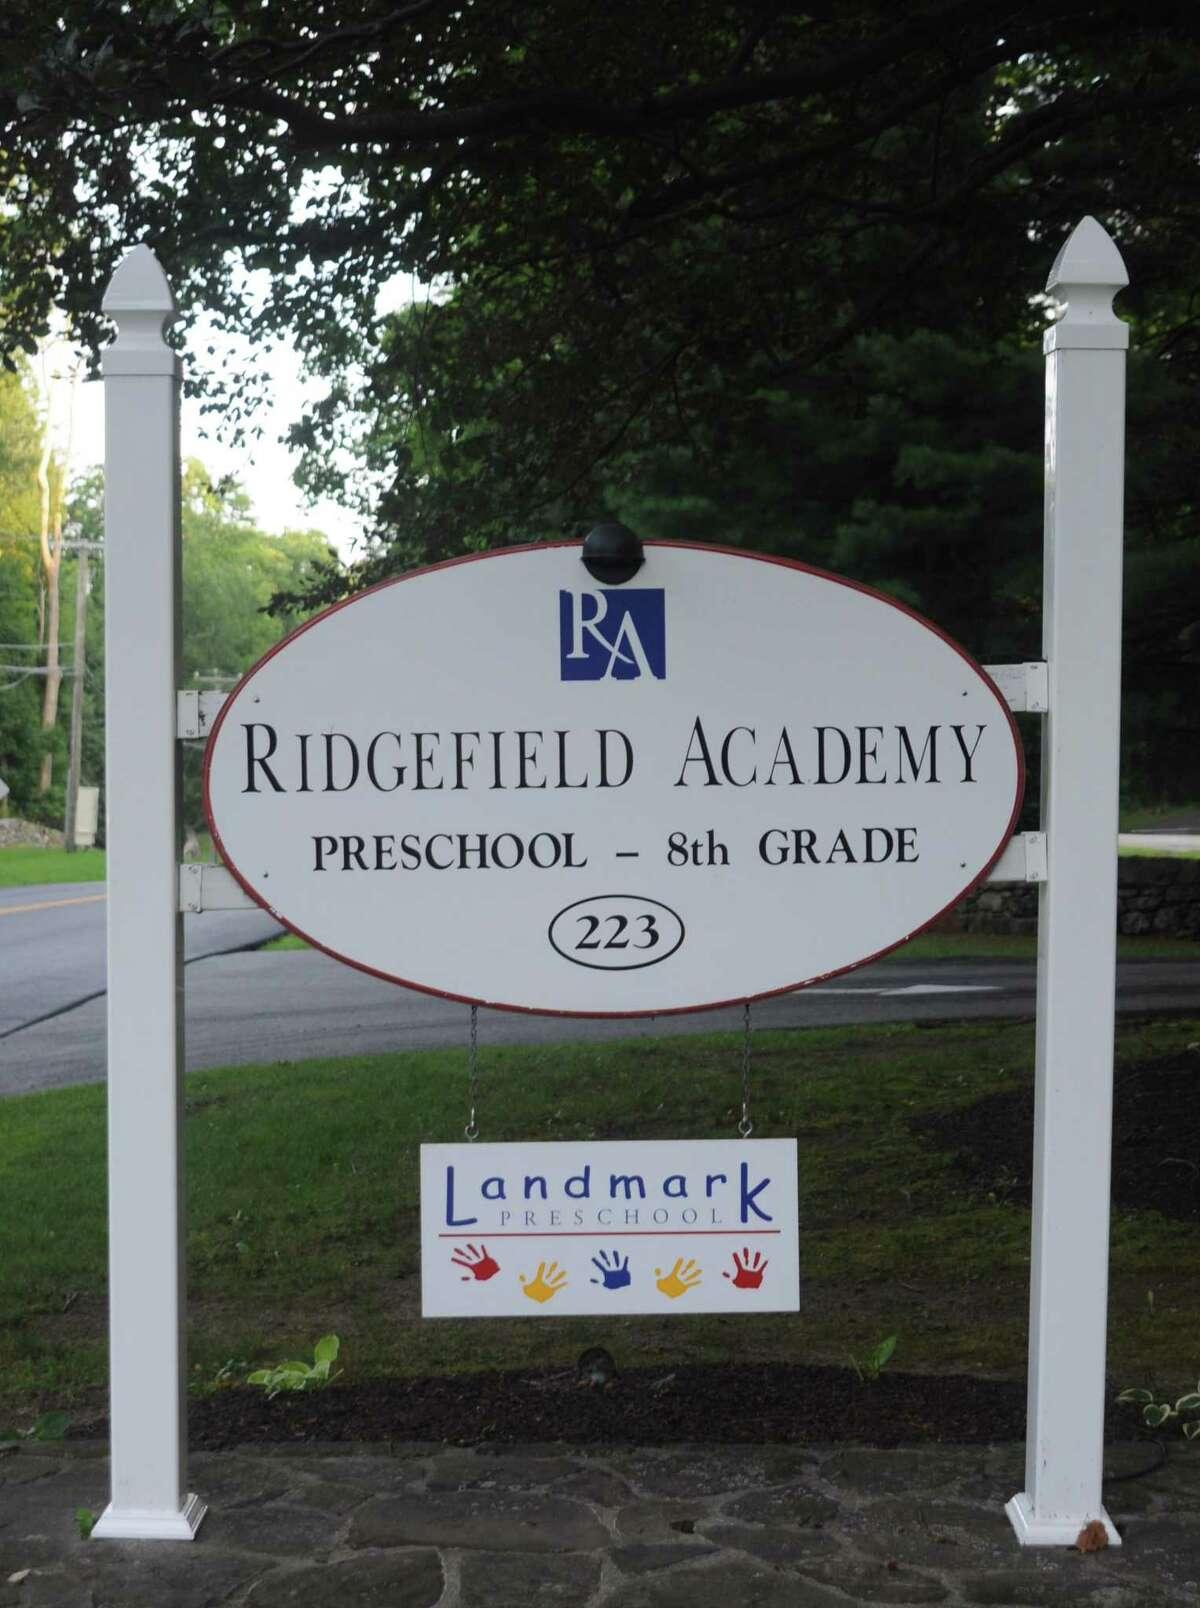 "The ""Landmark Preschool"" sign hangs underneath the Ridgefield Academy marker at the shared campus off West Mountain Road. Landmark also has preschools in Westport and Bedford, N.Y."